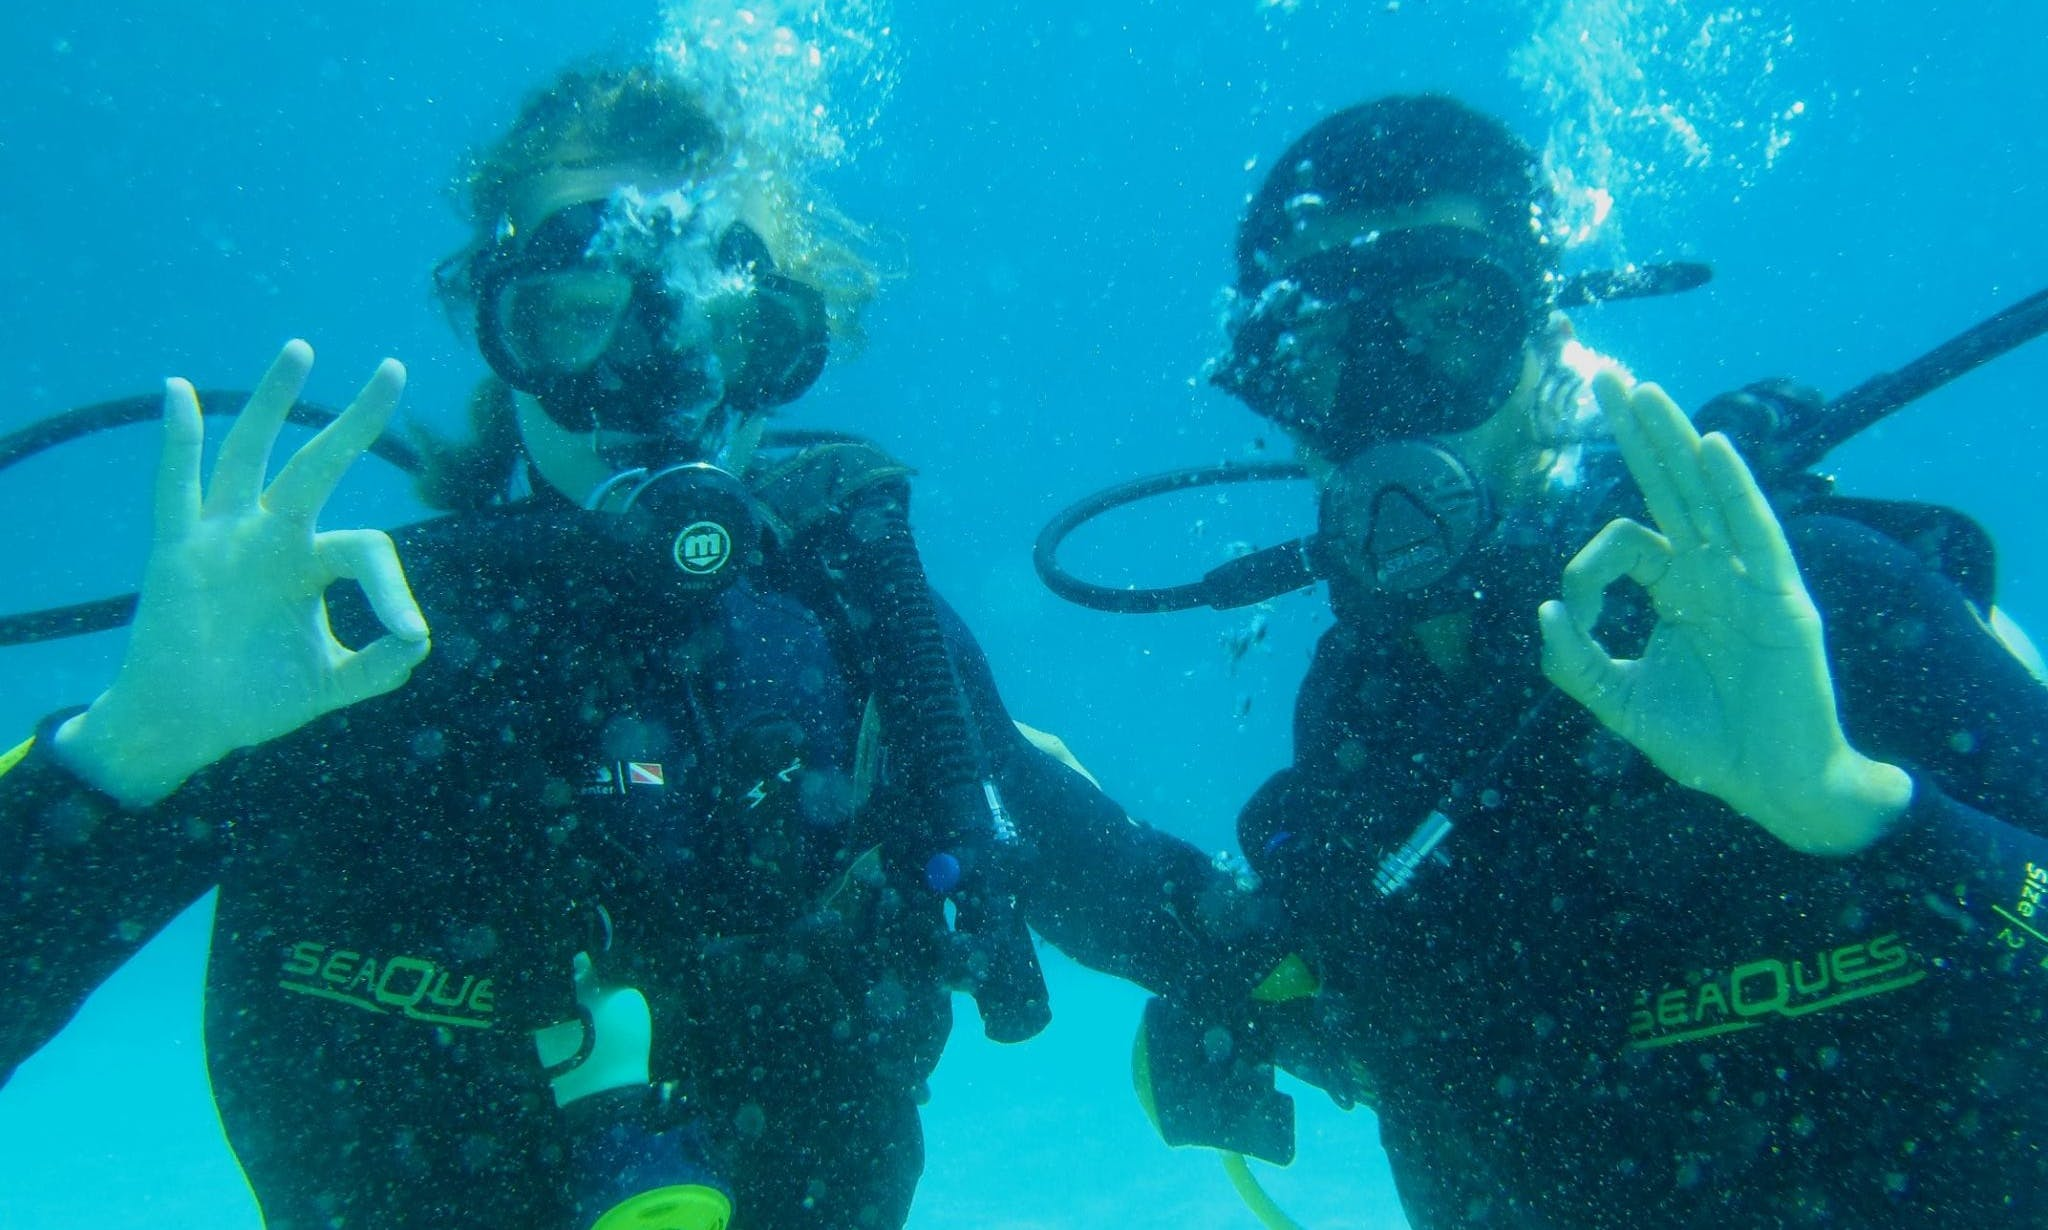 Diving Trips and Excursions in Thành phố Nha Trang, Vietnam